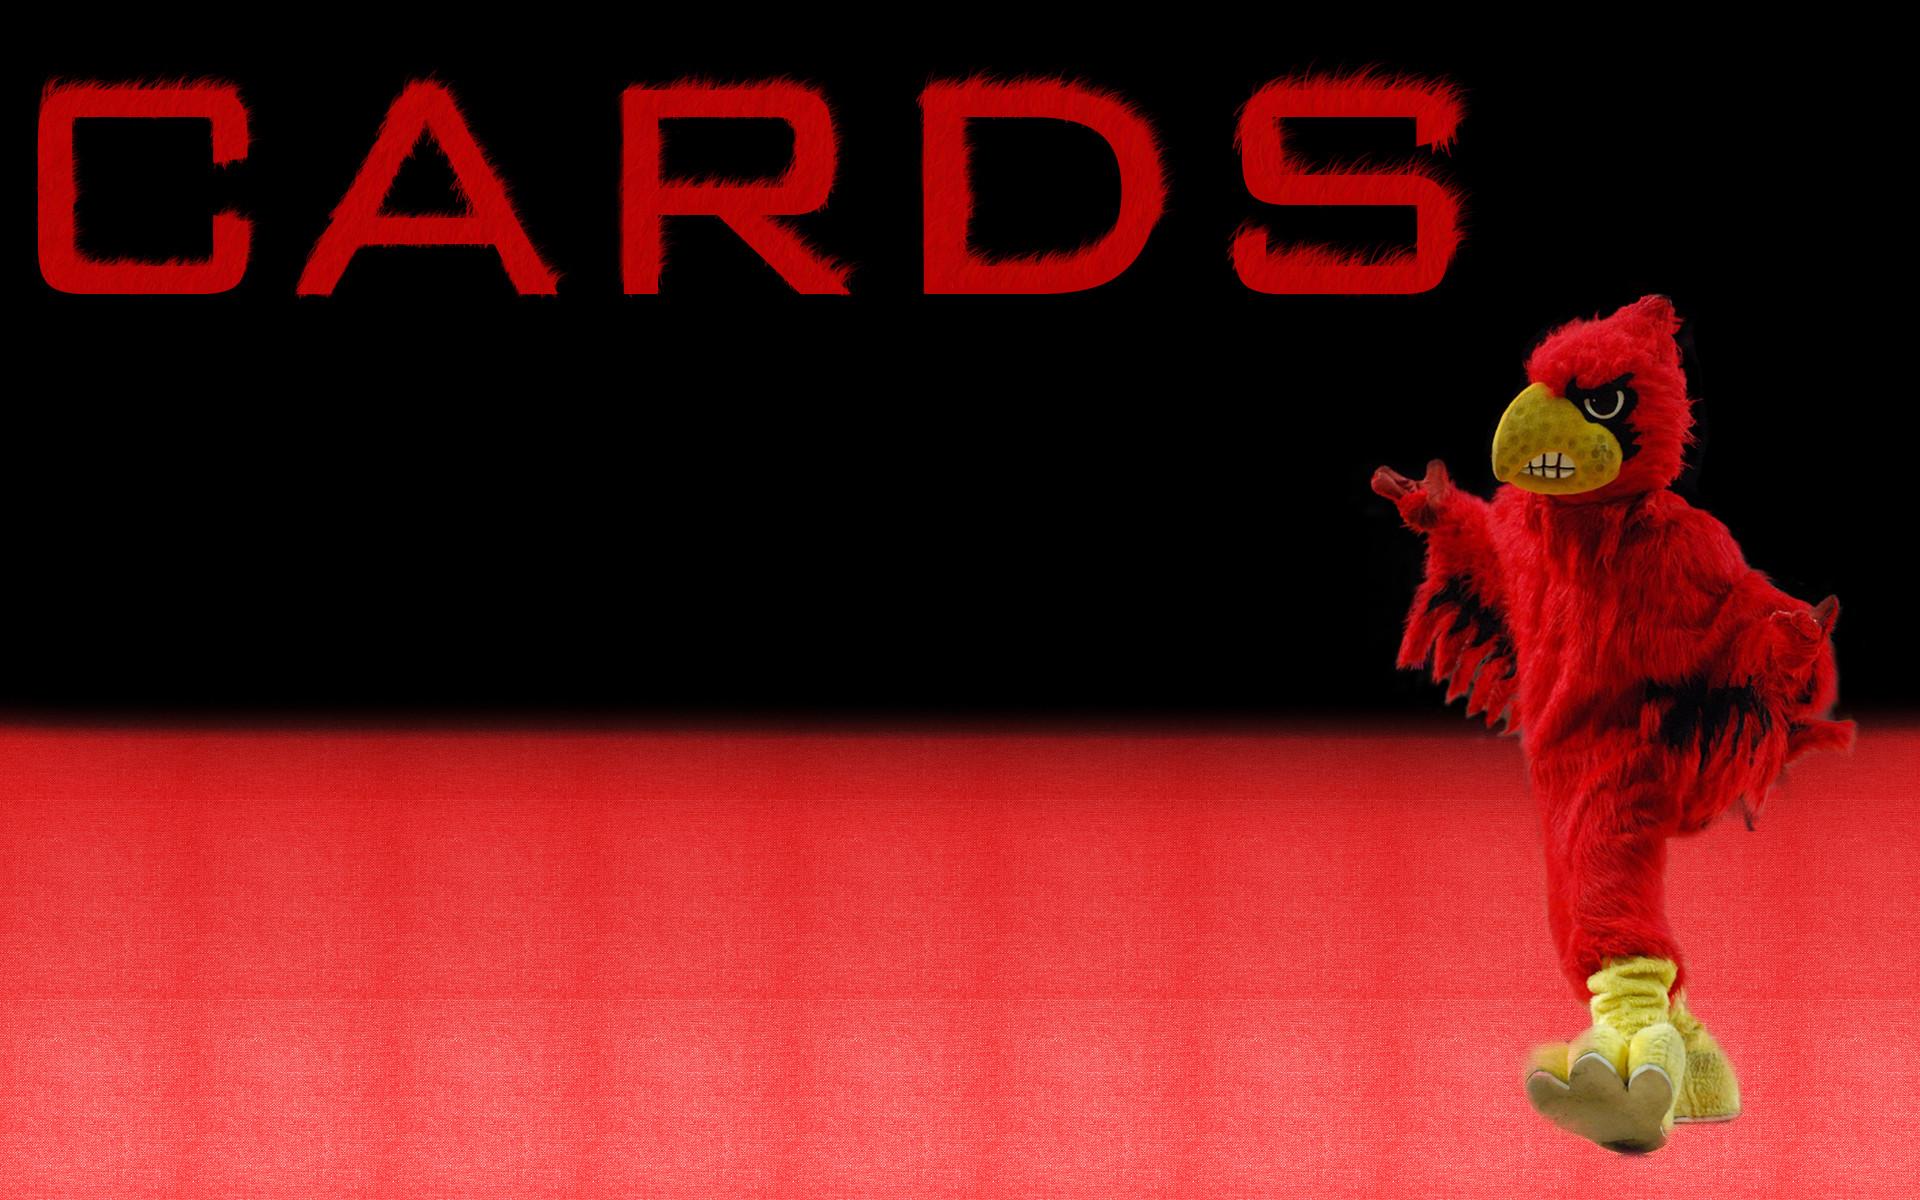 Louisville Cards Background